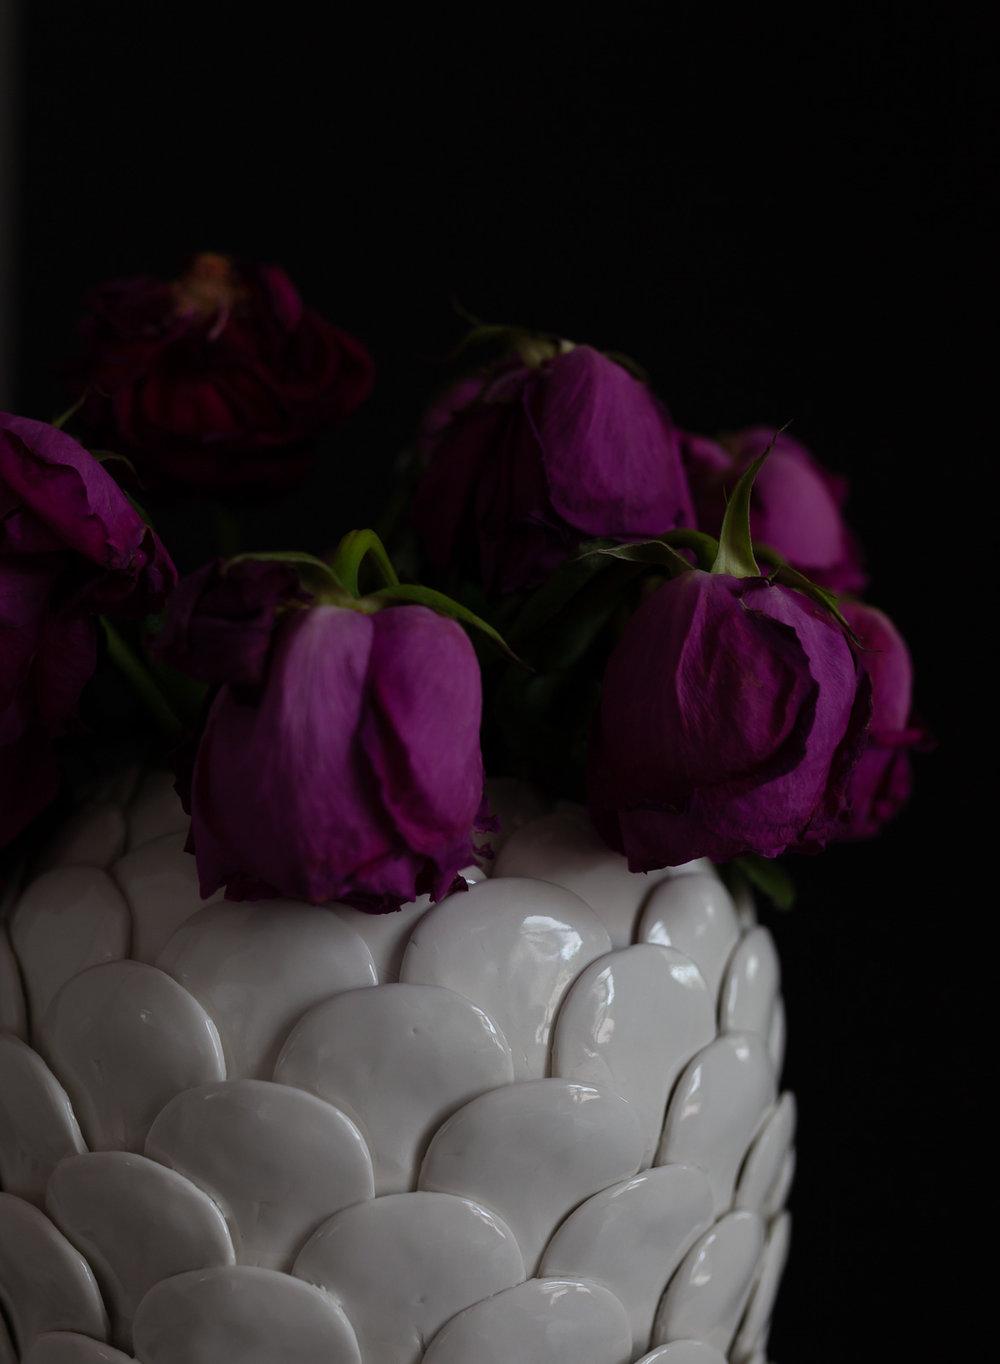 Roses30MINUTES-8.jpg